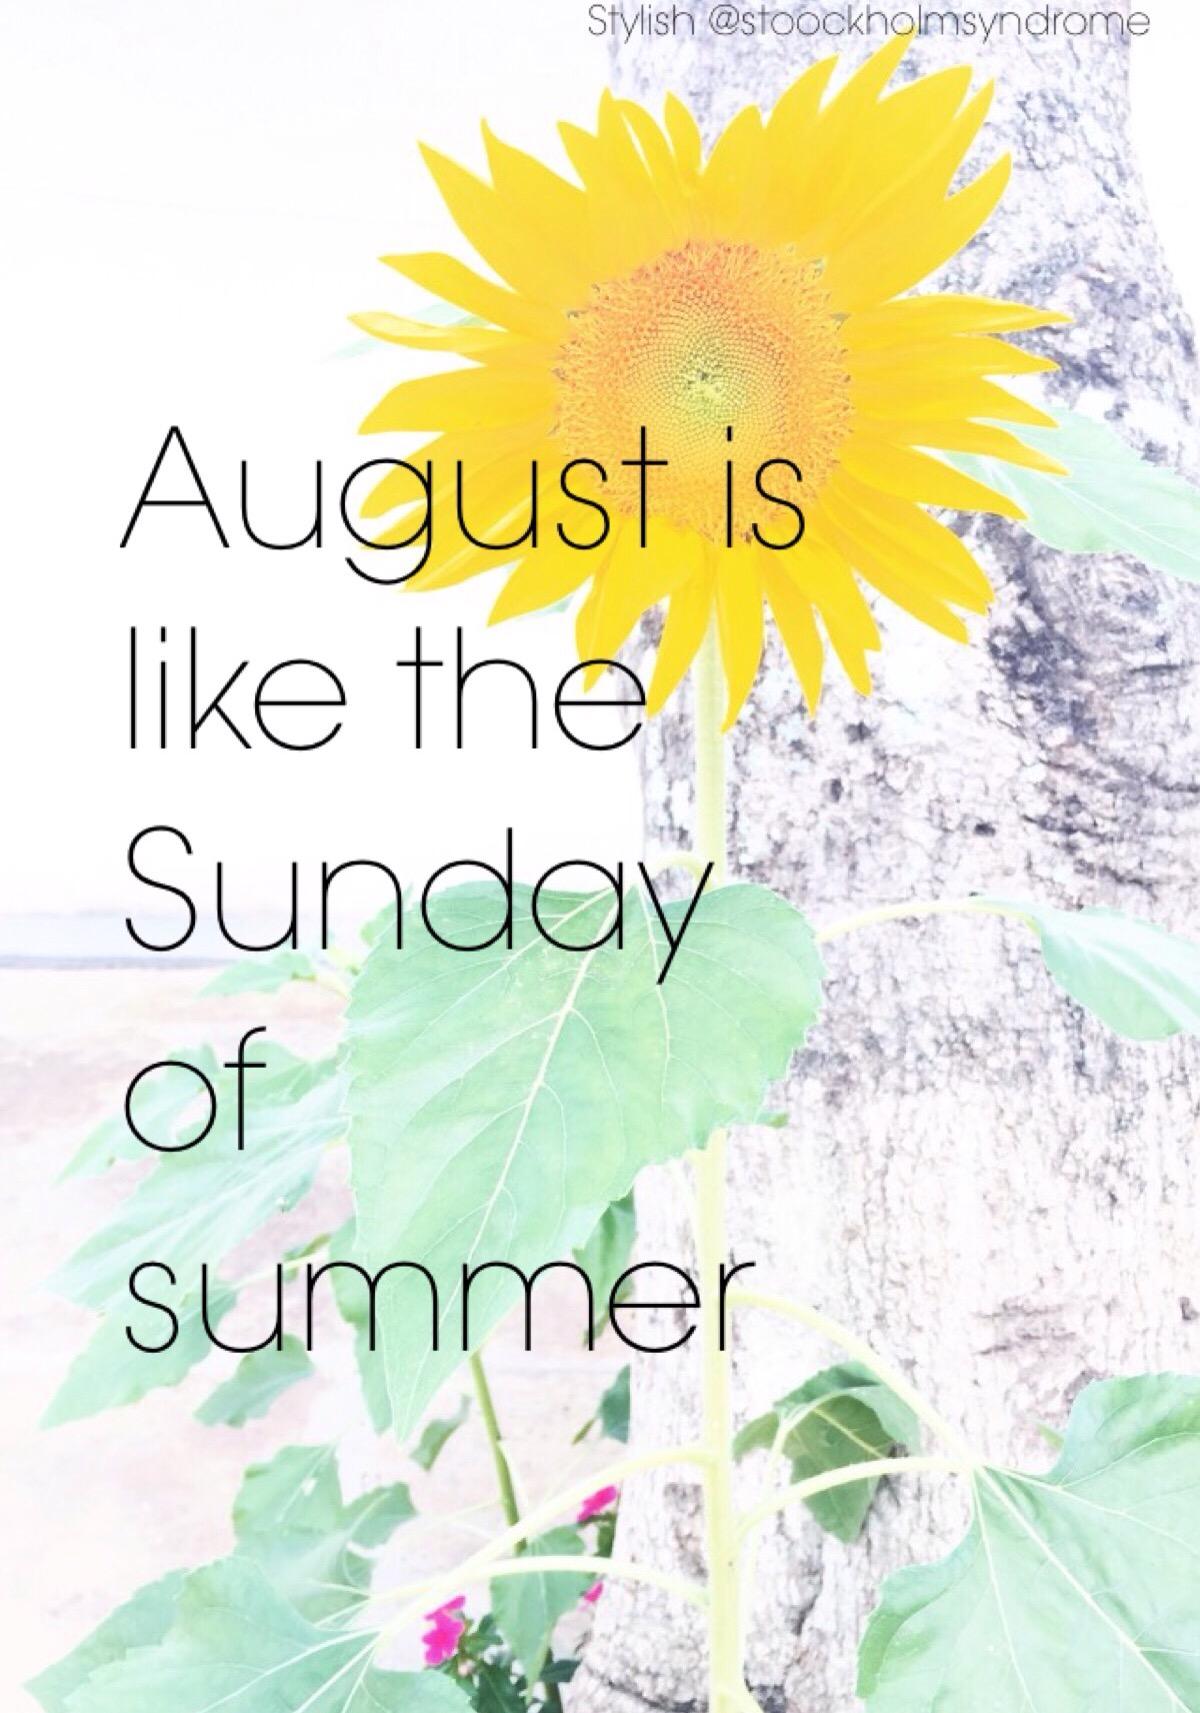 summer inspiration quotes stylish